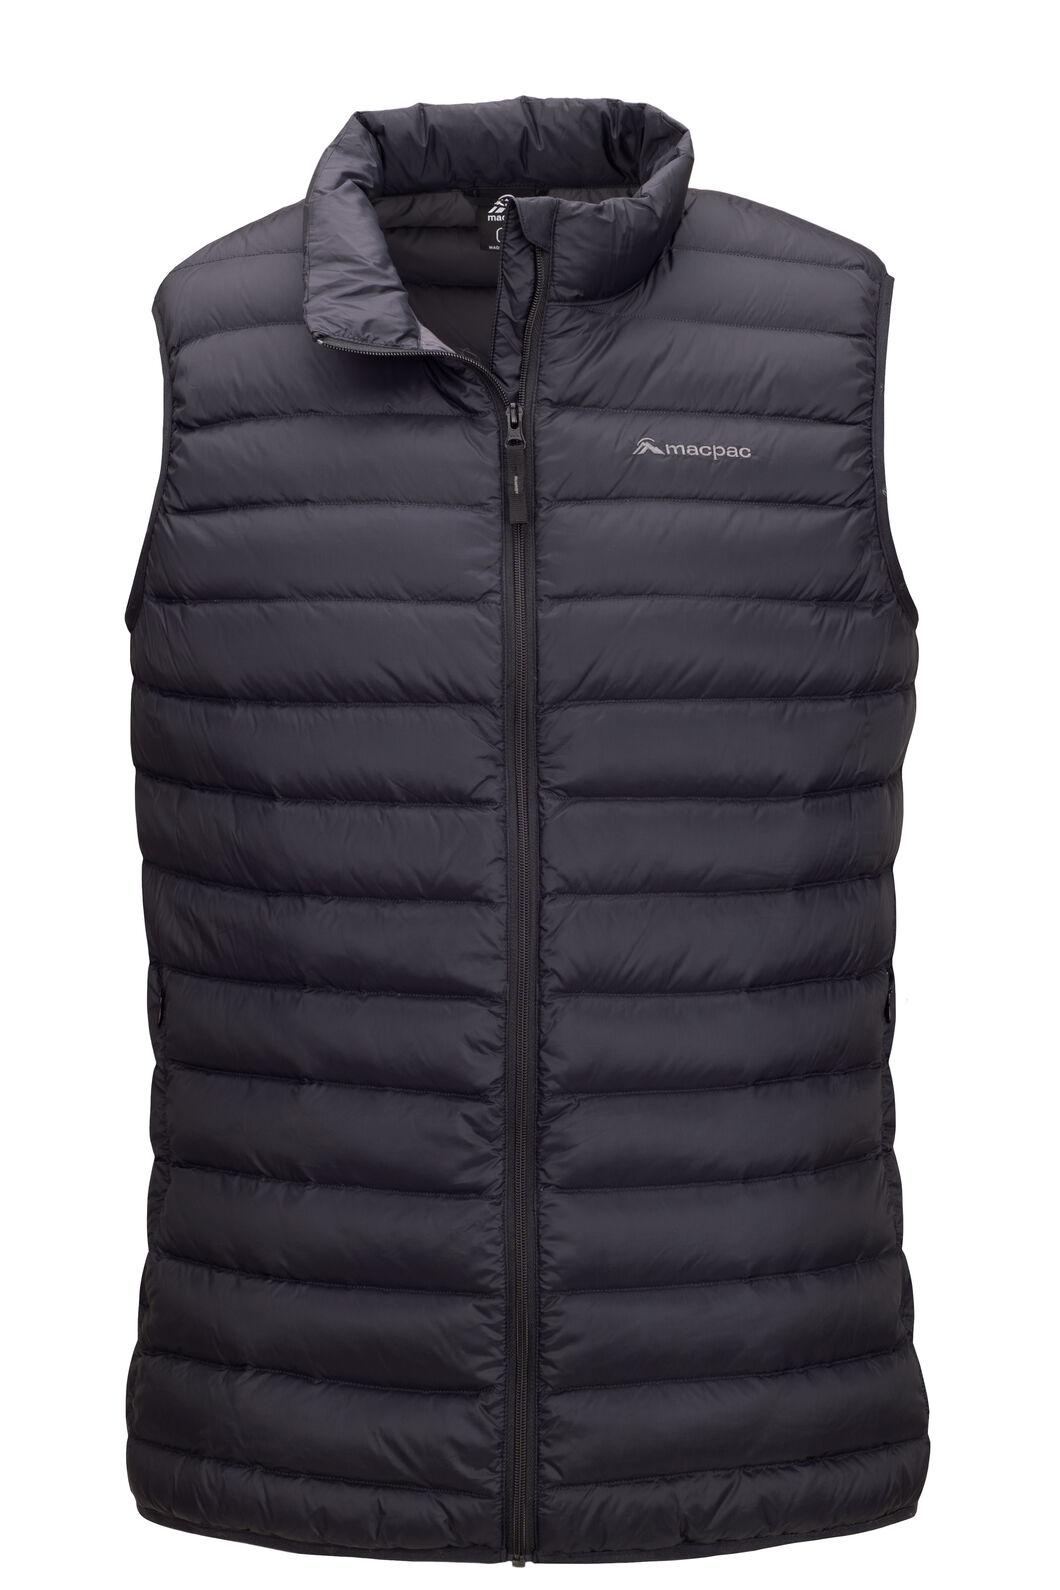 Macpac Uber Light Down Vest — Men's, Black, hi-res